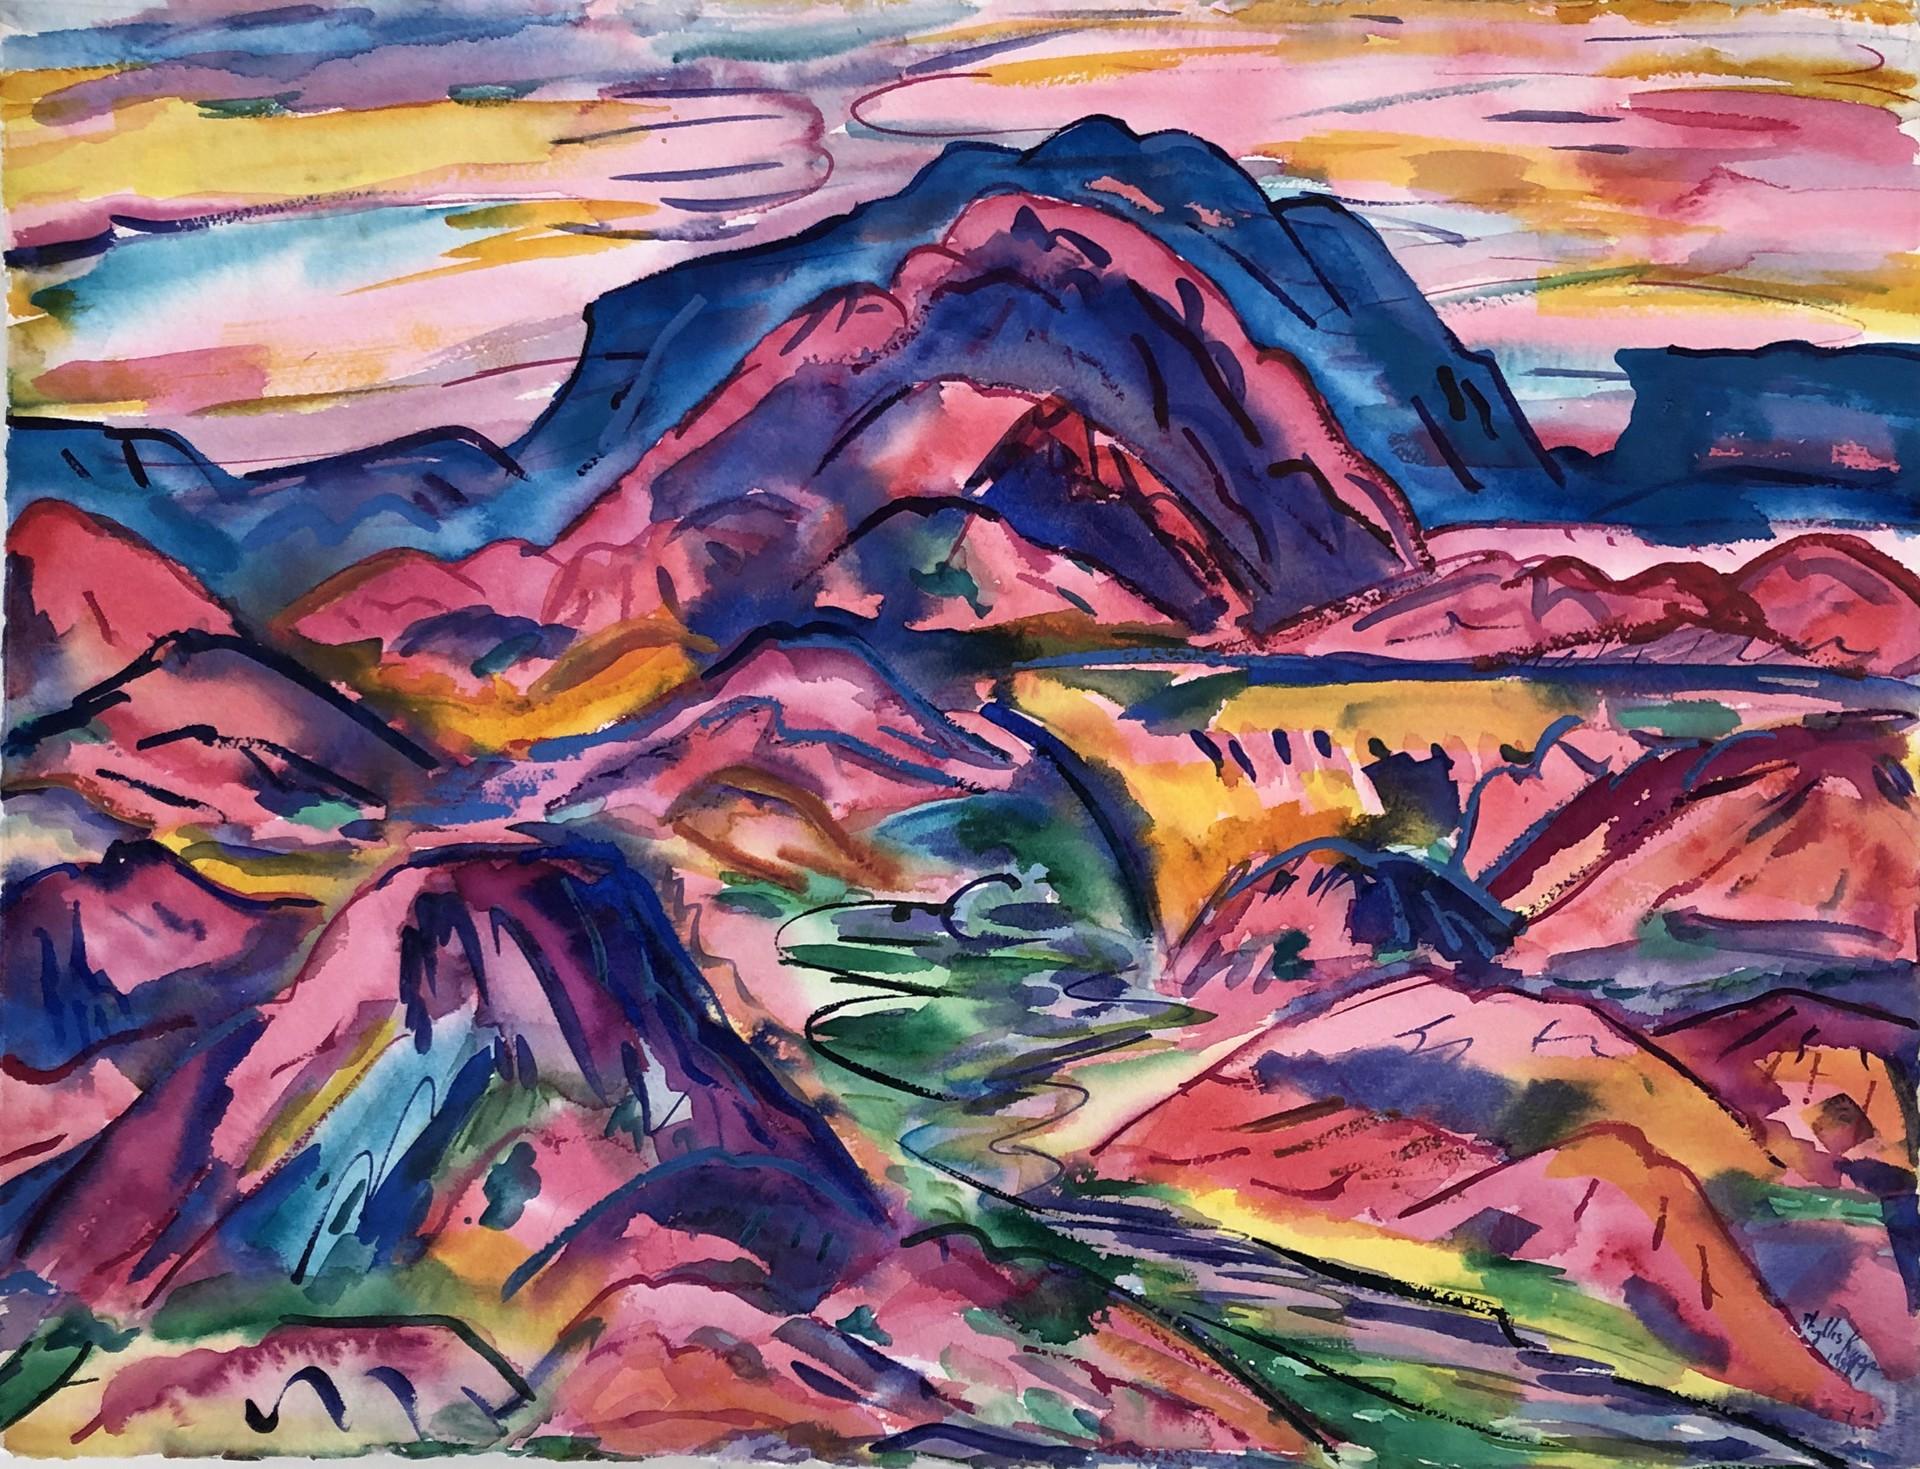 Pink Dream by Phyllis Kapp